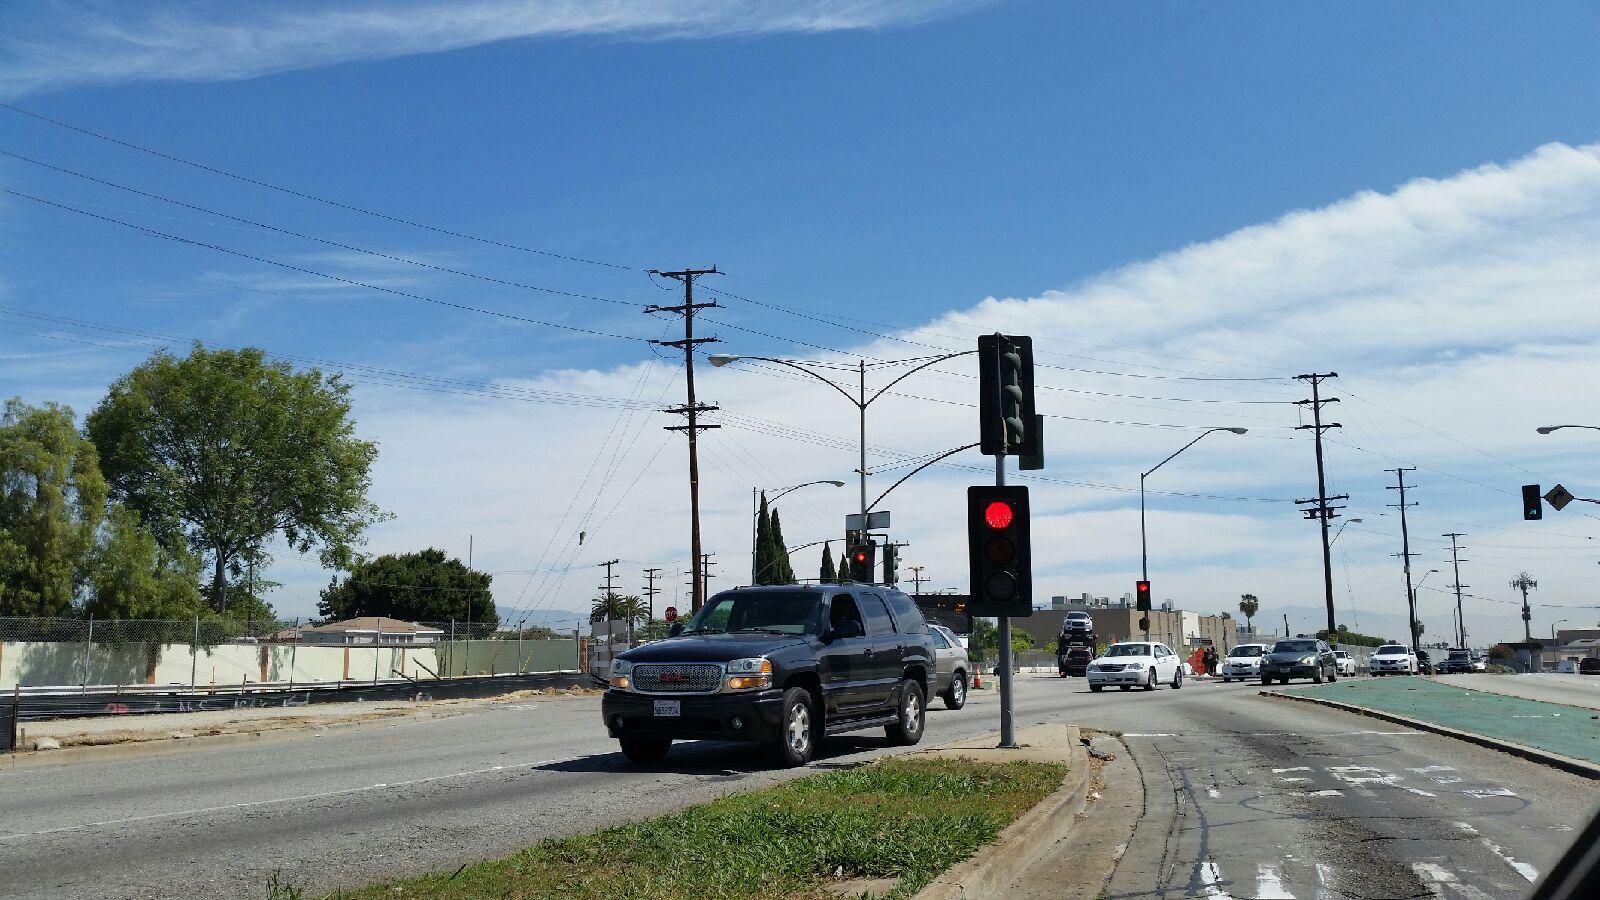 Redondo Boulevard will be permanently close at Florence Avenue for construction of the Crenshaw/LAX light rail line. Jose Ubaldo/Metro.